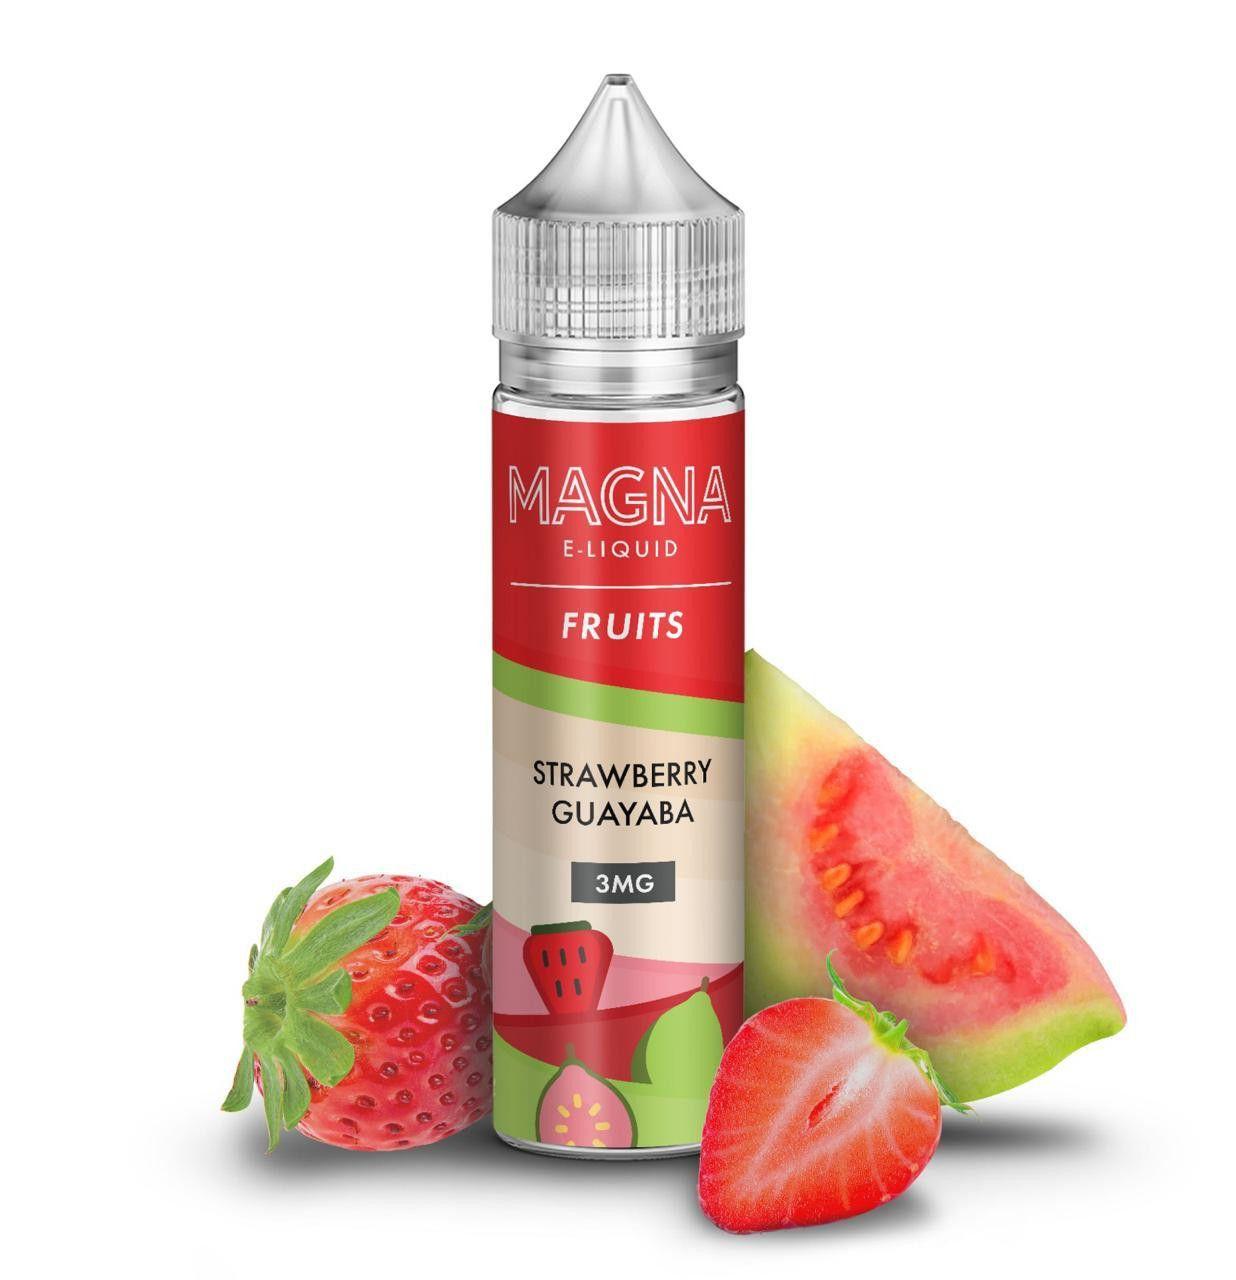 Strawberry Guayaba by Magna E-liquid